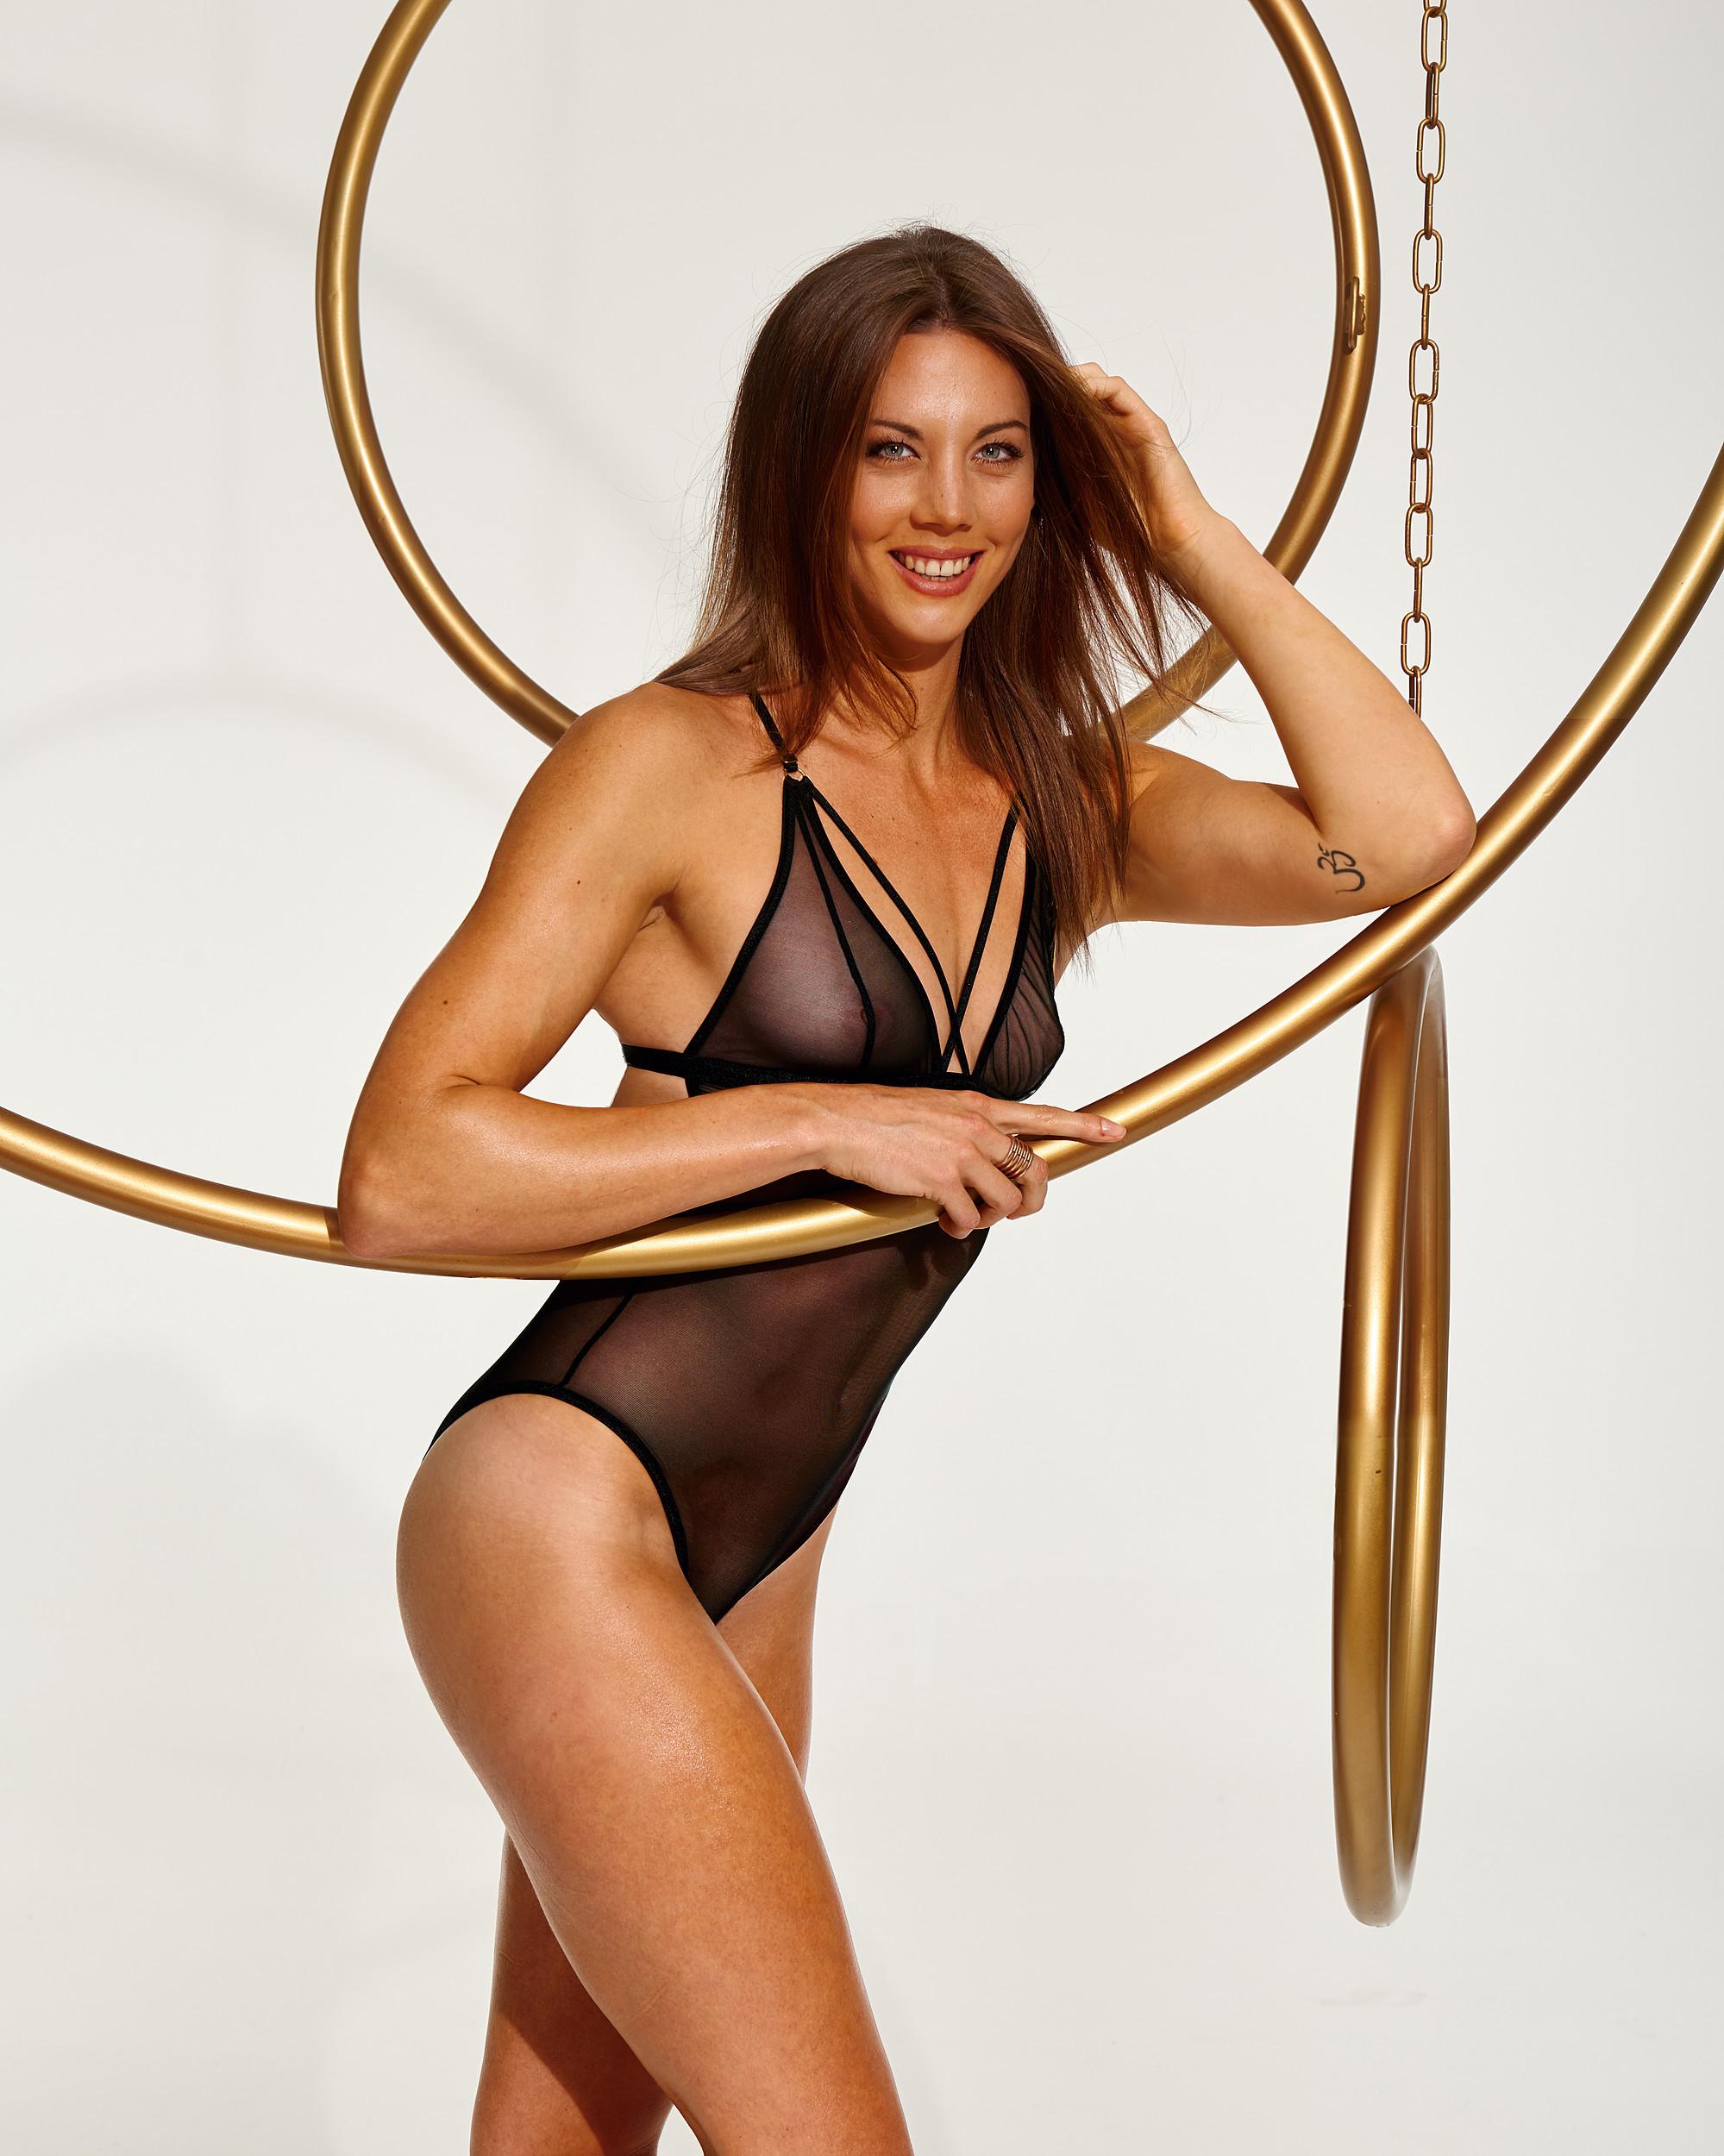 Немецкая спортсменка Katharina Bauer